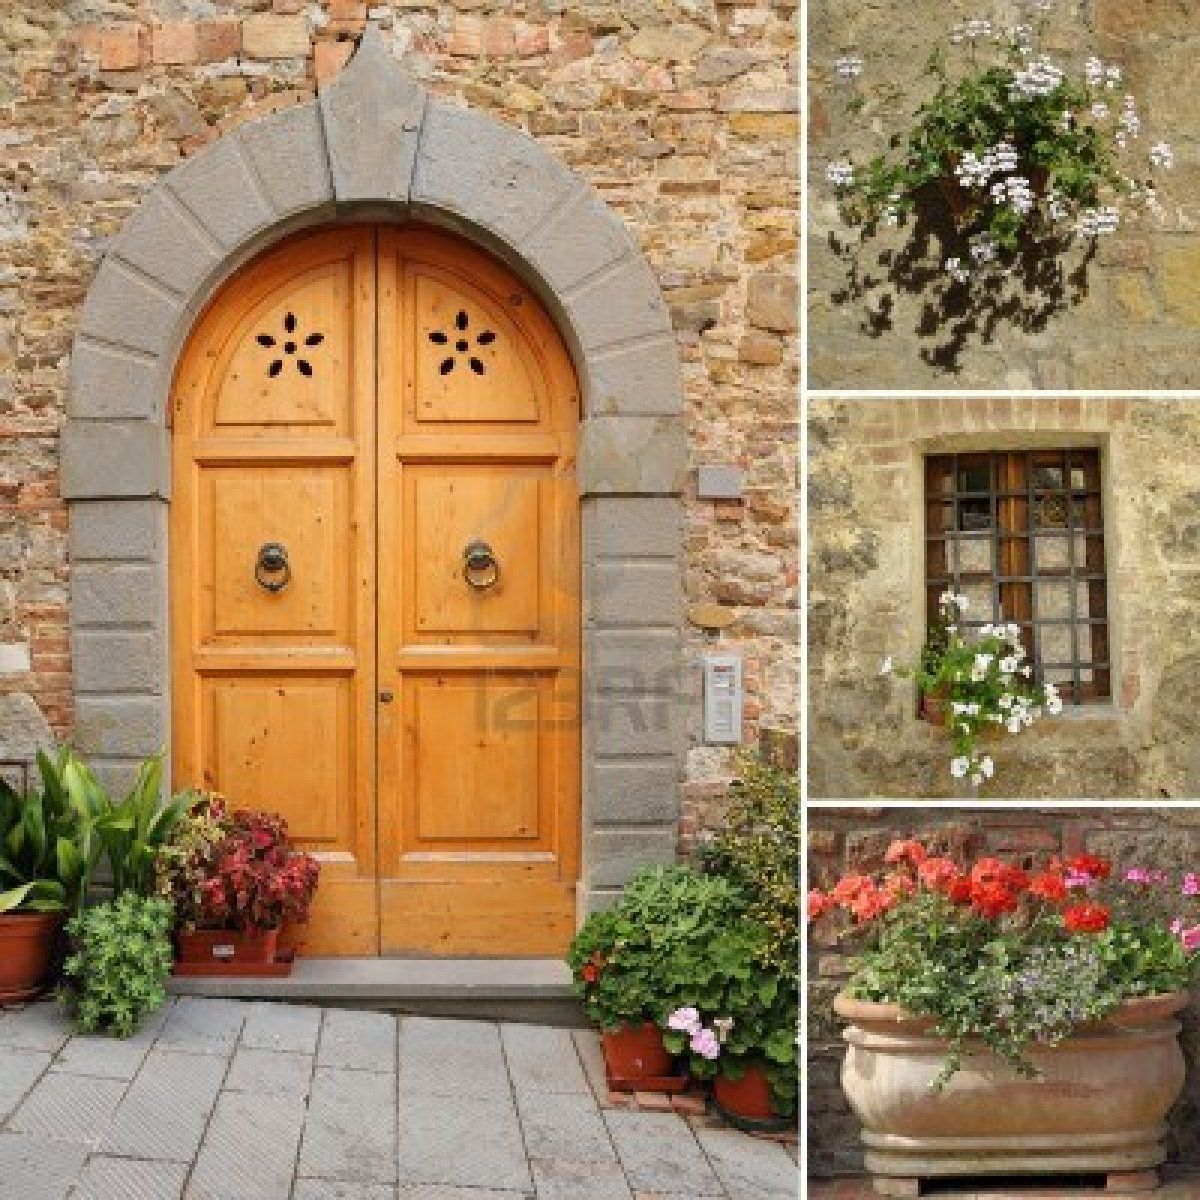 Google Image Result for http://us.123rf.com/400wm/400/400/mkistryn/mkistryn1203/mkistryn120300055/12839289-images-from-tuscany-italy-europe.jpg